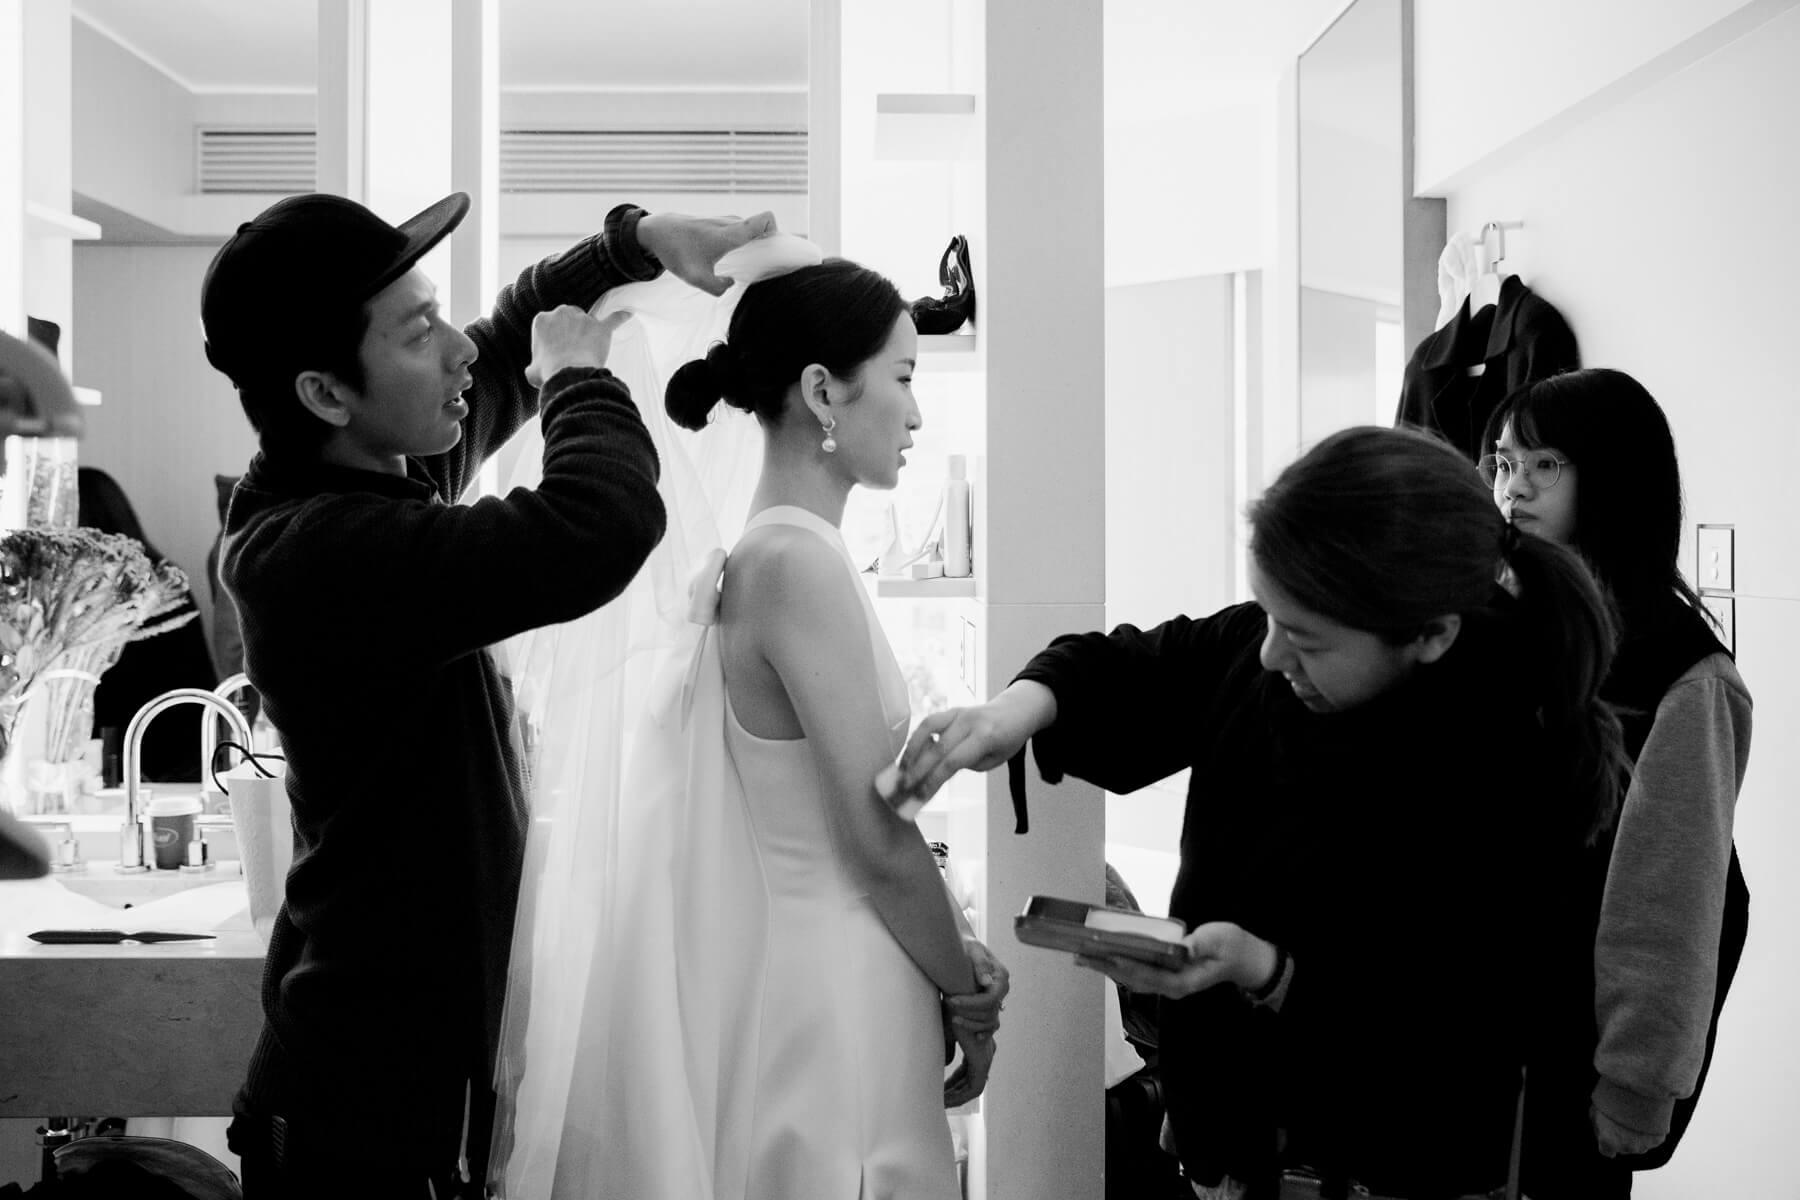 nikkiloveu-hongkong-weddingday-theupperhouse-as-007.jpg